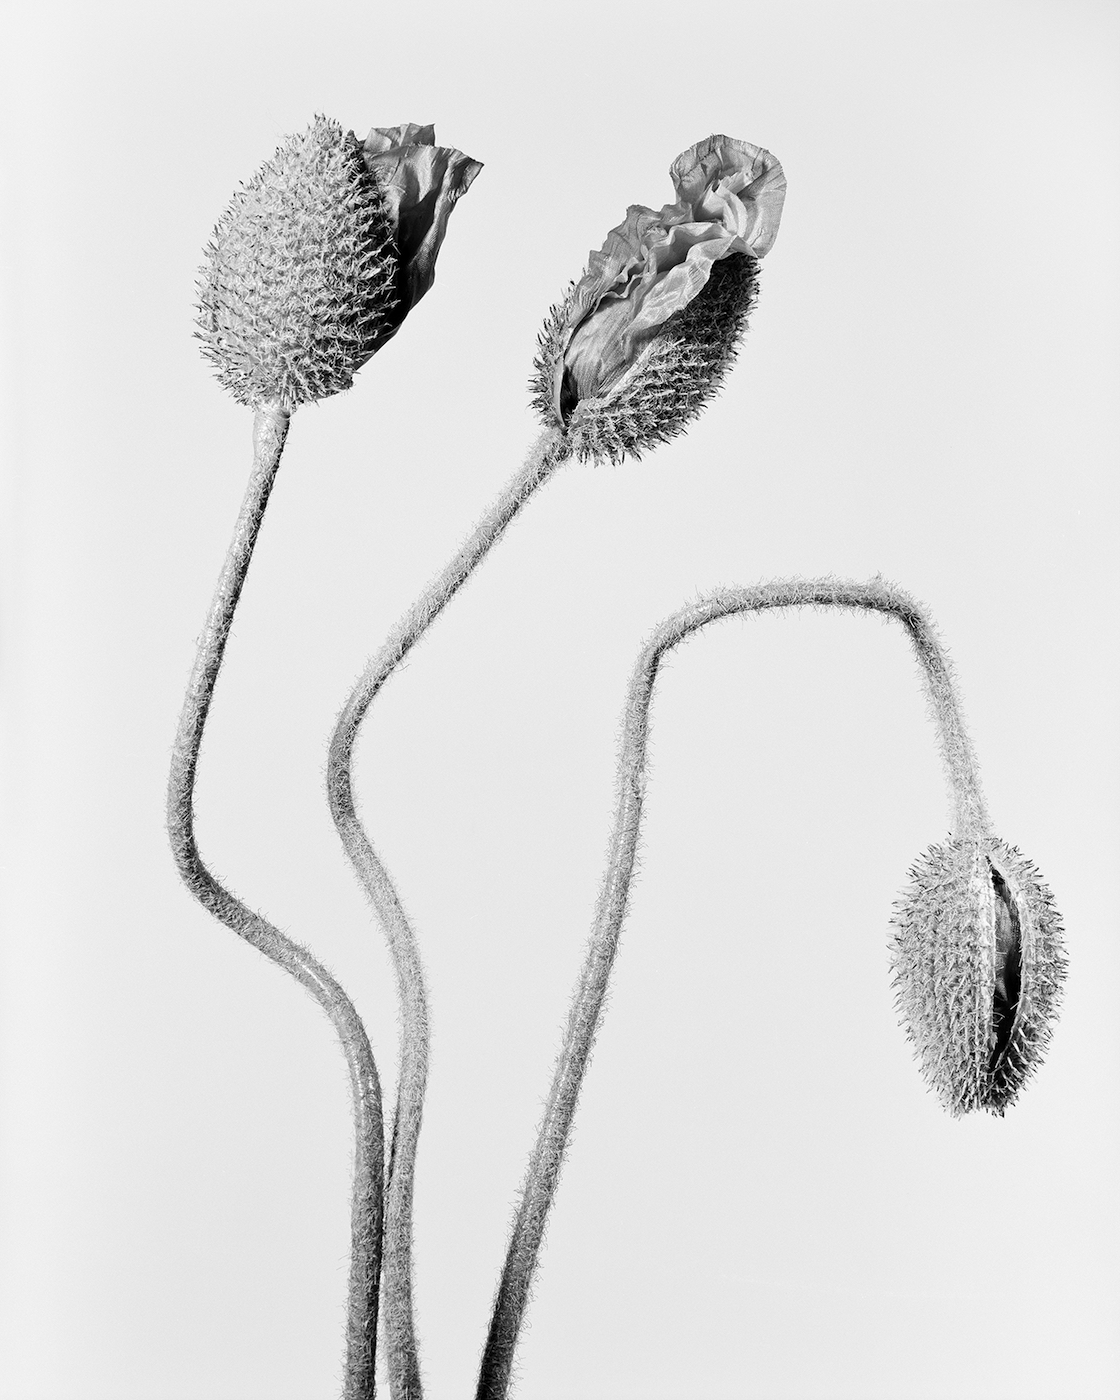 Robert Voit: The Alphabet of New Plants